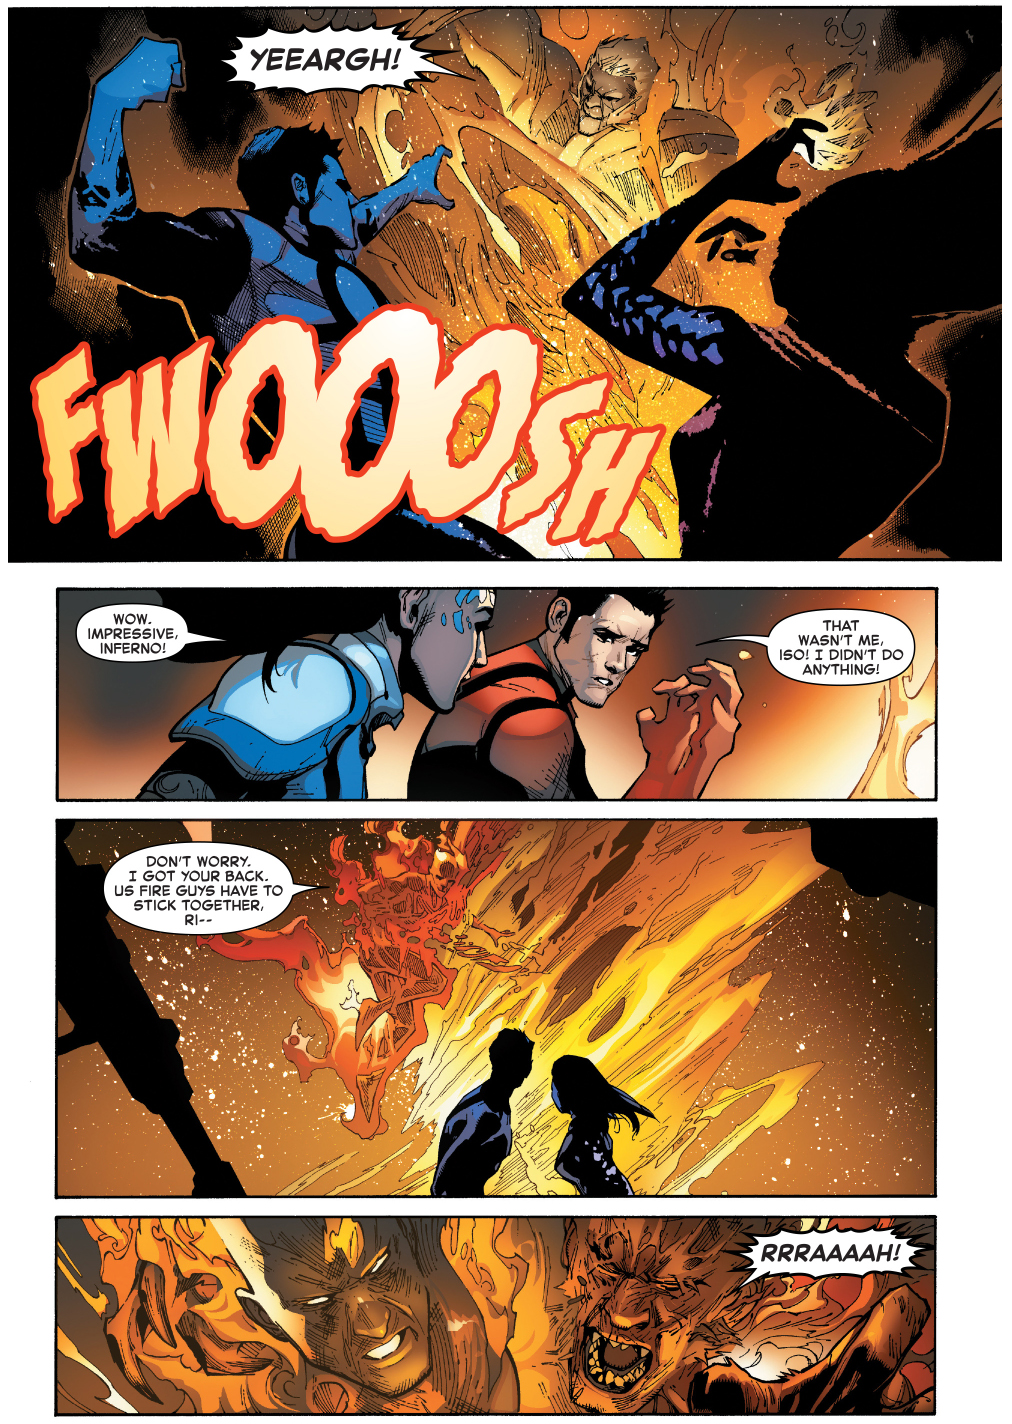 sabretooth-vs-human-torch-ivx